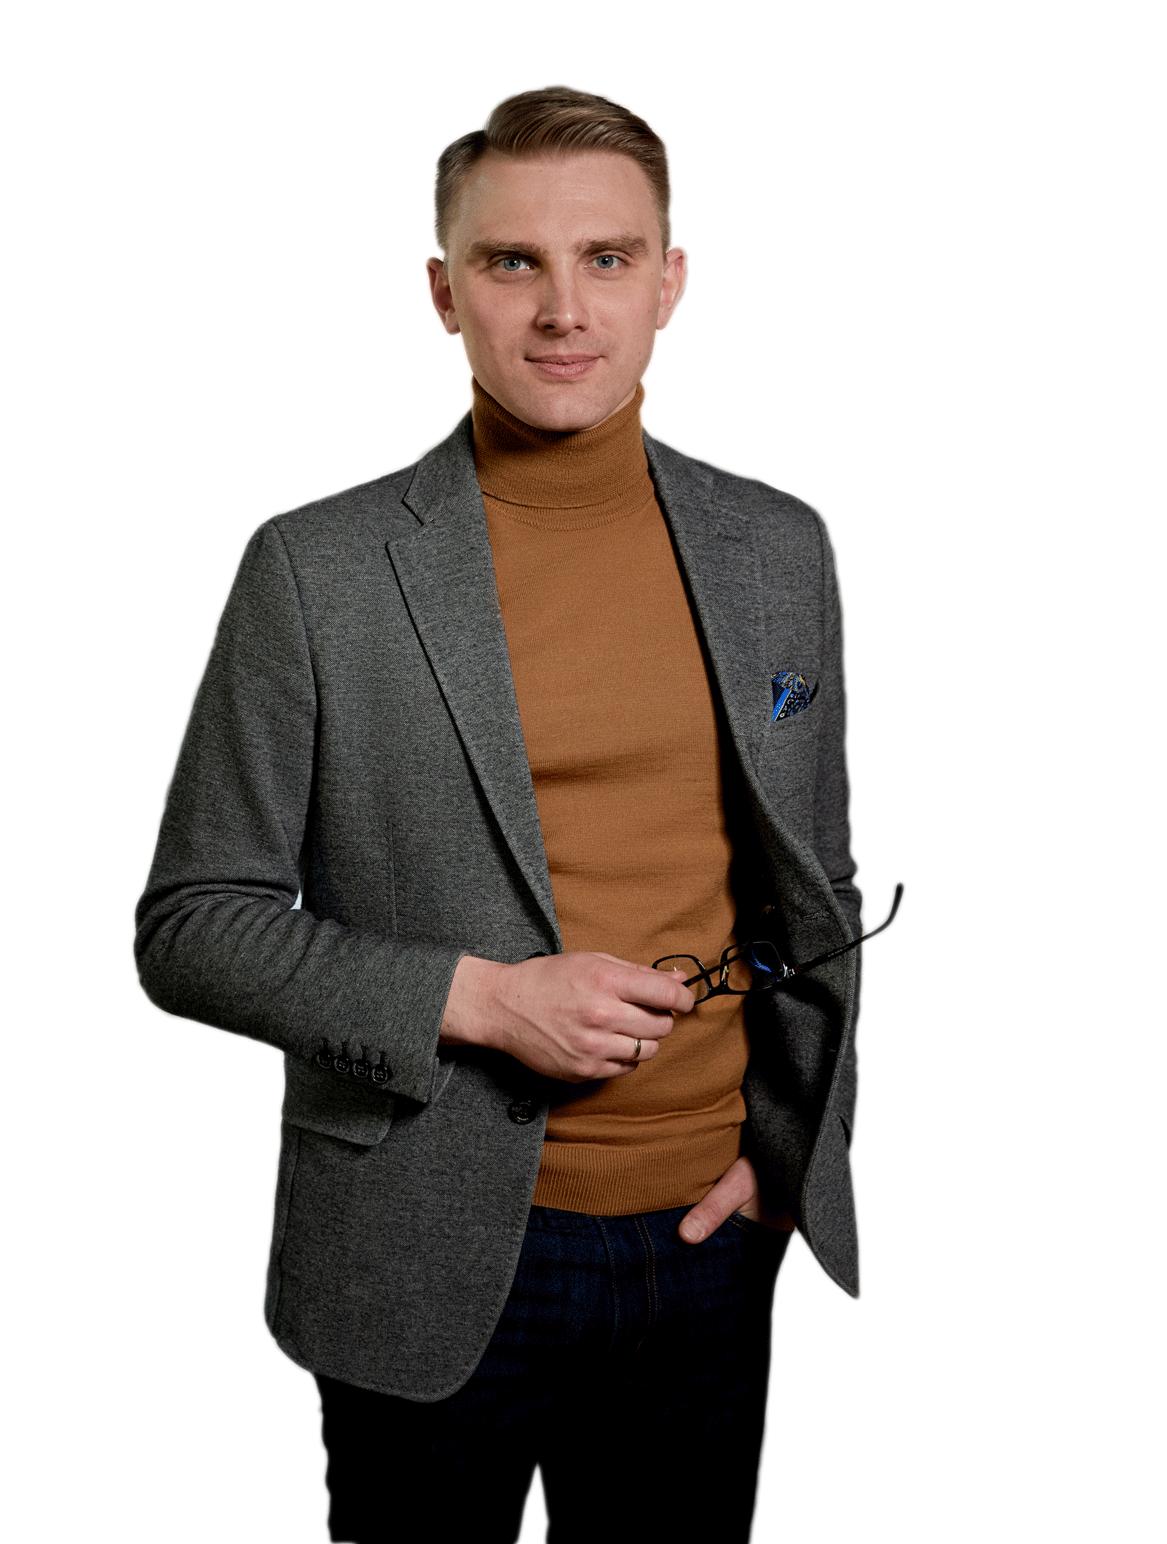 Mikolaj-Maslinski-Prawnik-Opakowania-BDO.png